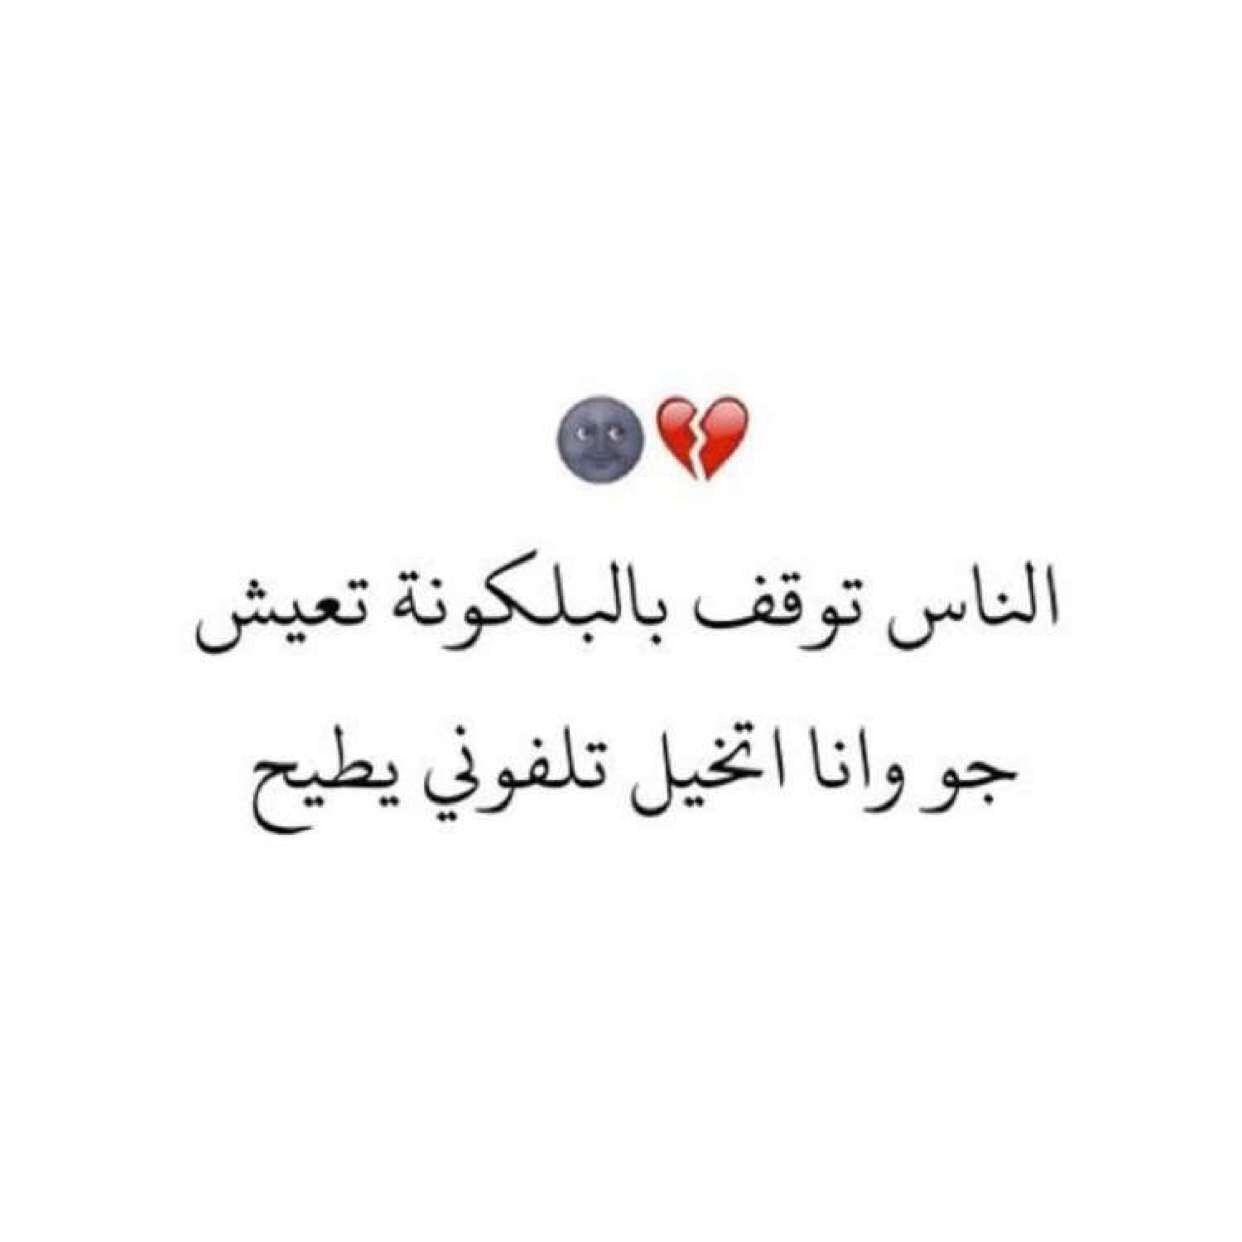 Pin By Nota On مما قرأت Arabic Funny Words Arabic Jokes